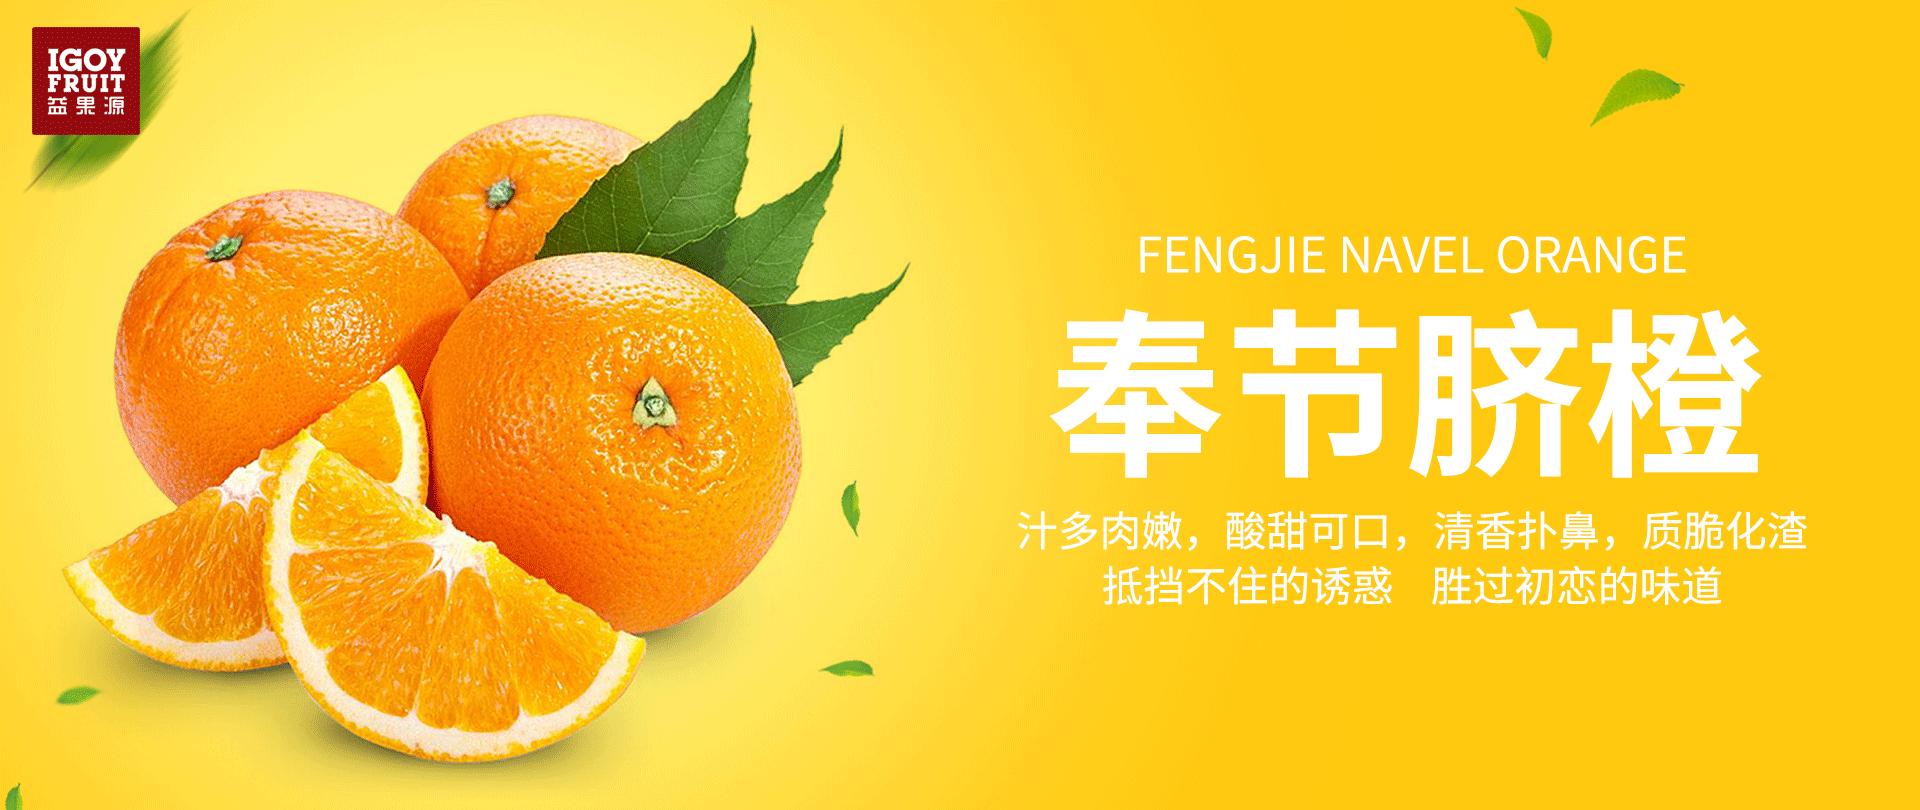 banner3_万博官方manbetx下载万博manbetx官方网站万博max手机客户端下载生活馆